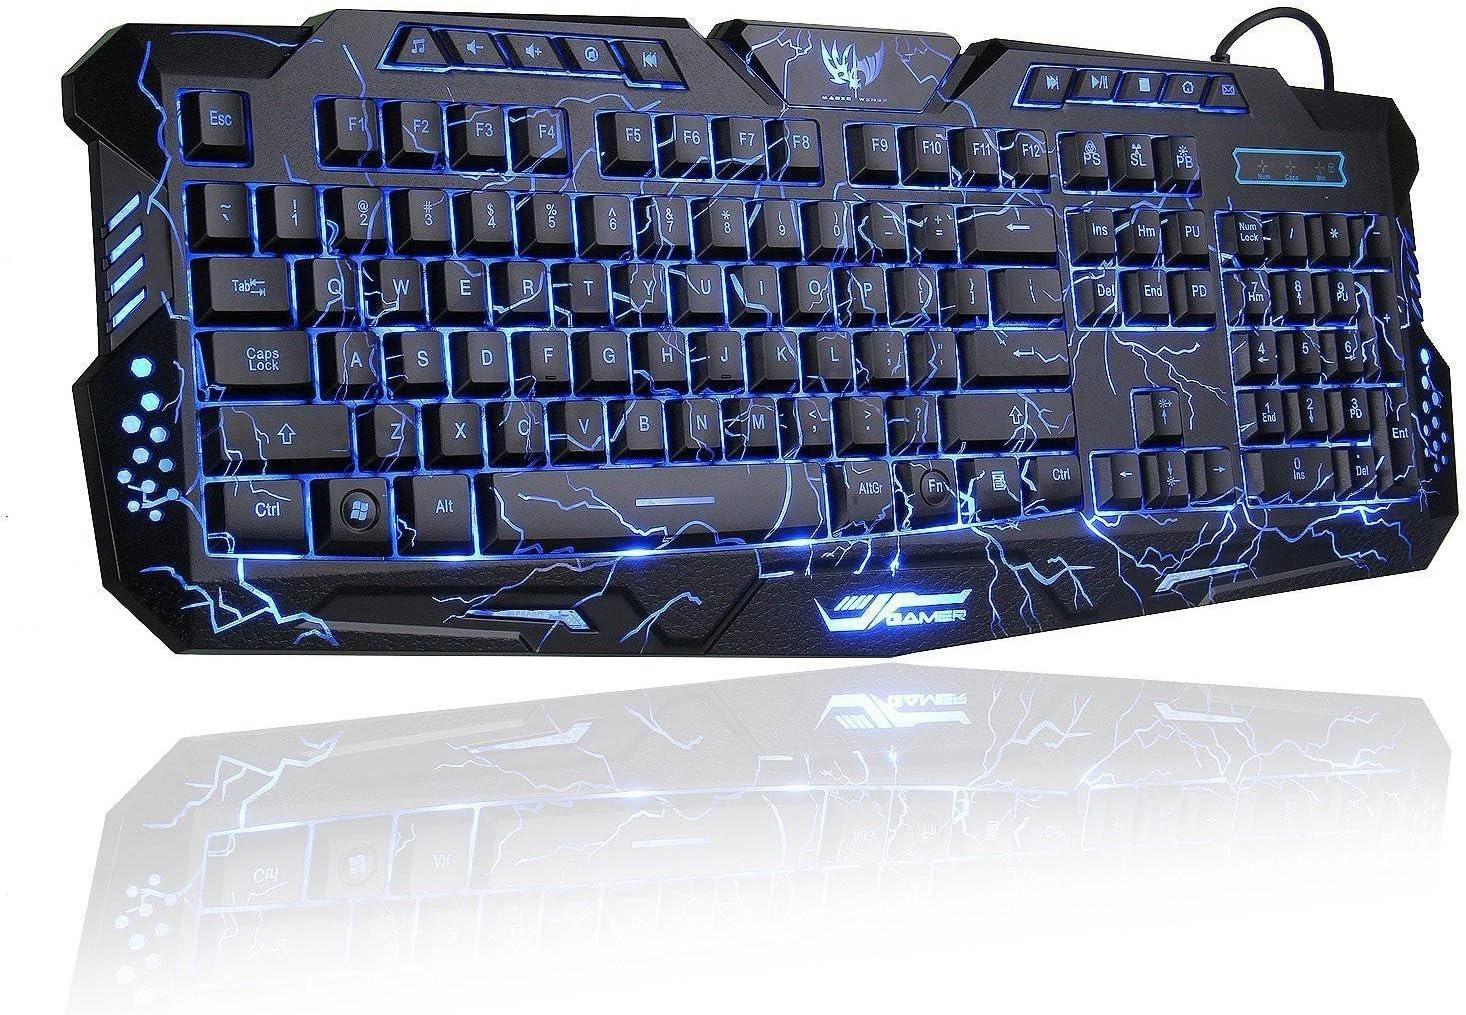 Vaorwne LED 3 Color Backlight//Crackle M-200 Multimedia Ergonomic USB Gaming Keyboard